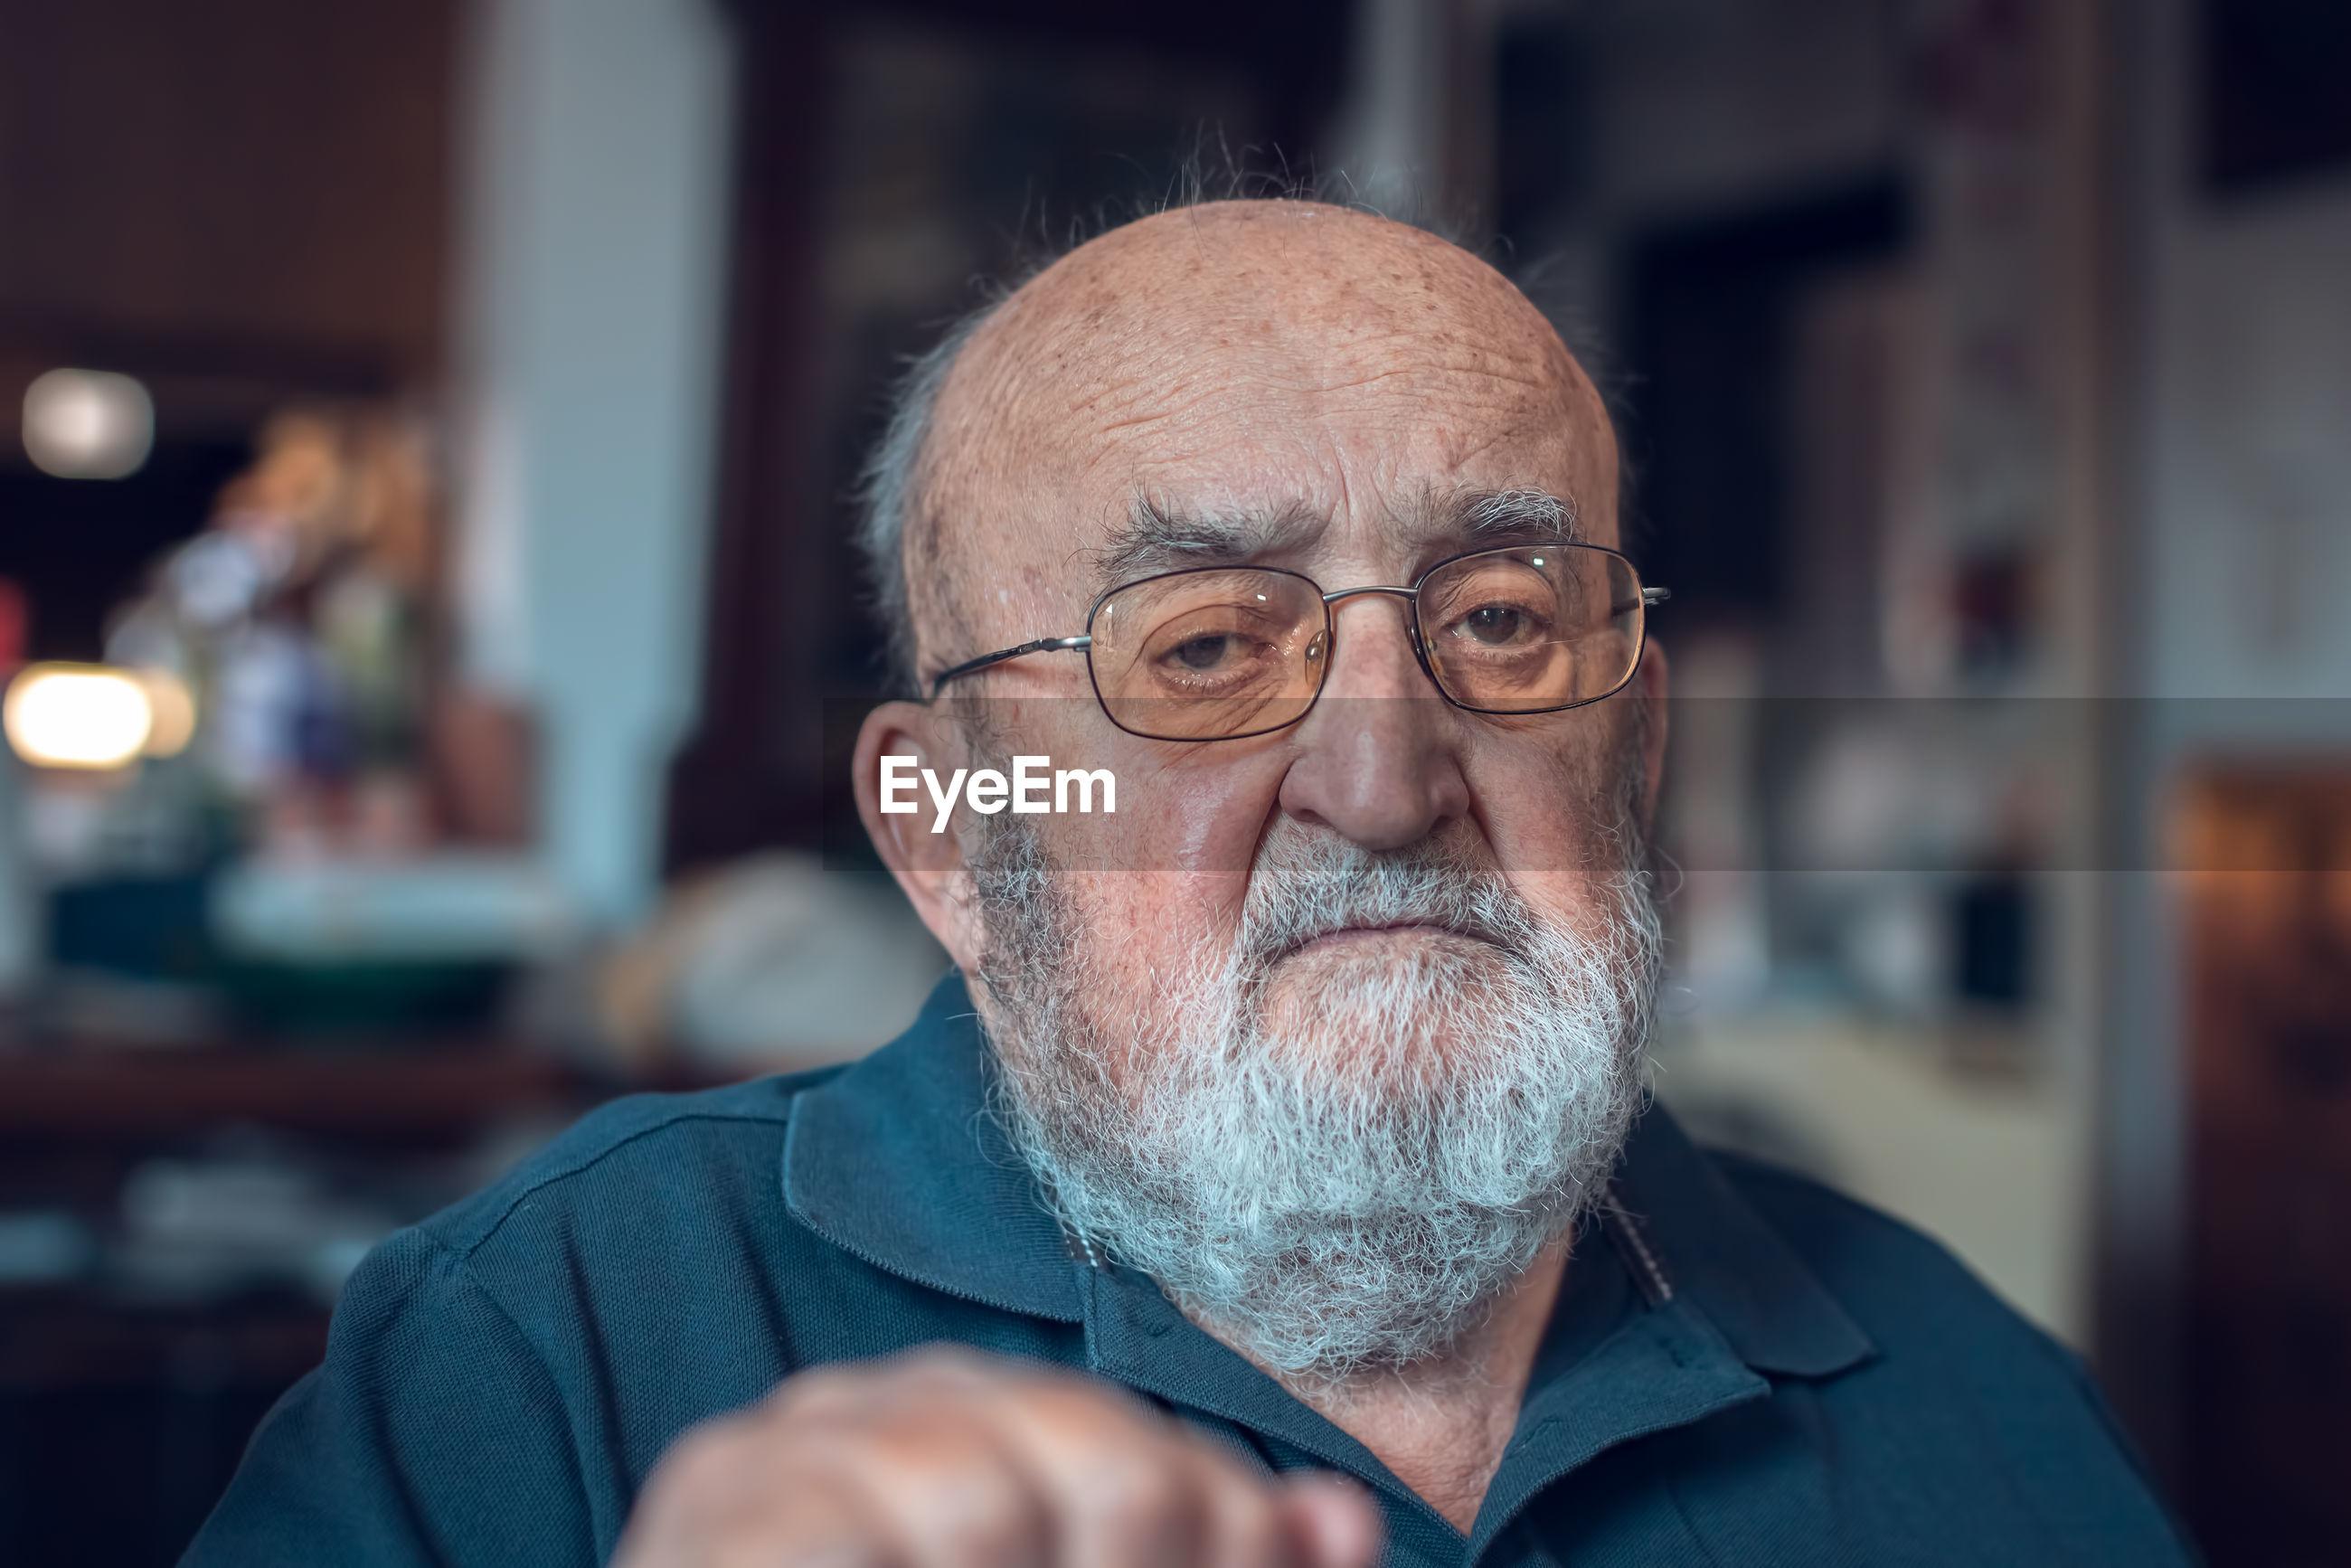 Portrait of old man wearing eyeglasses